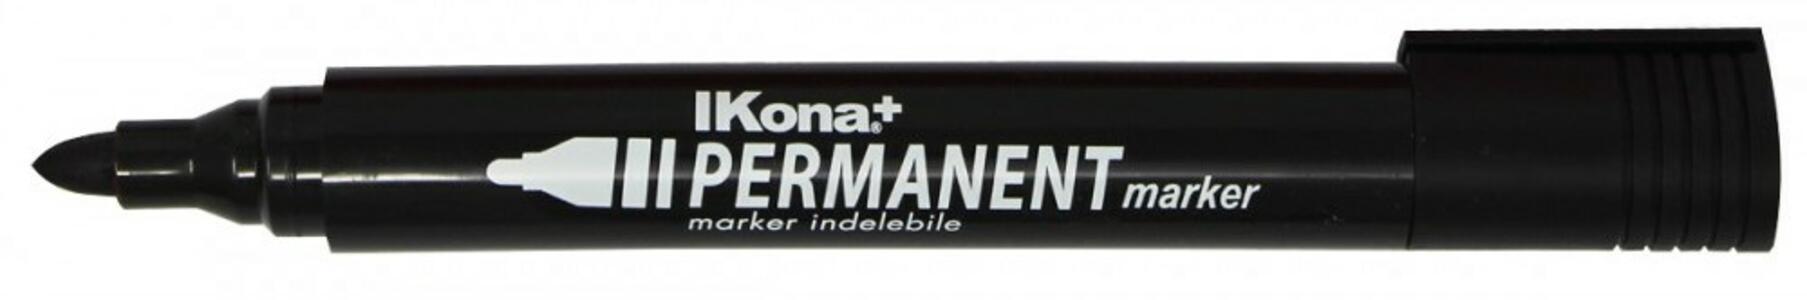 MARKER PERMANENTE NERO P.TONDA IKONA+